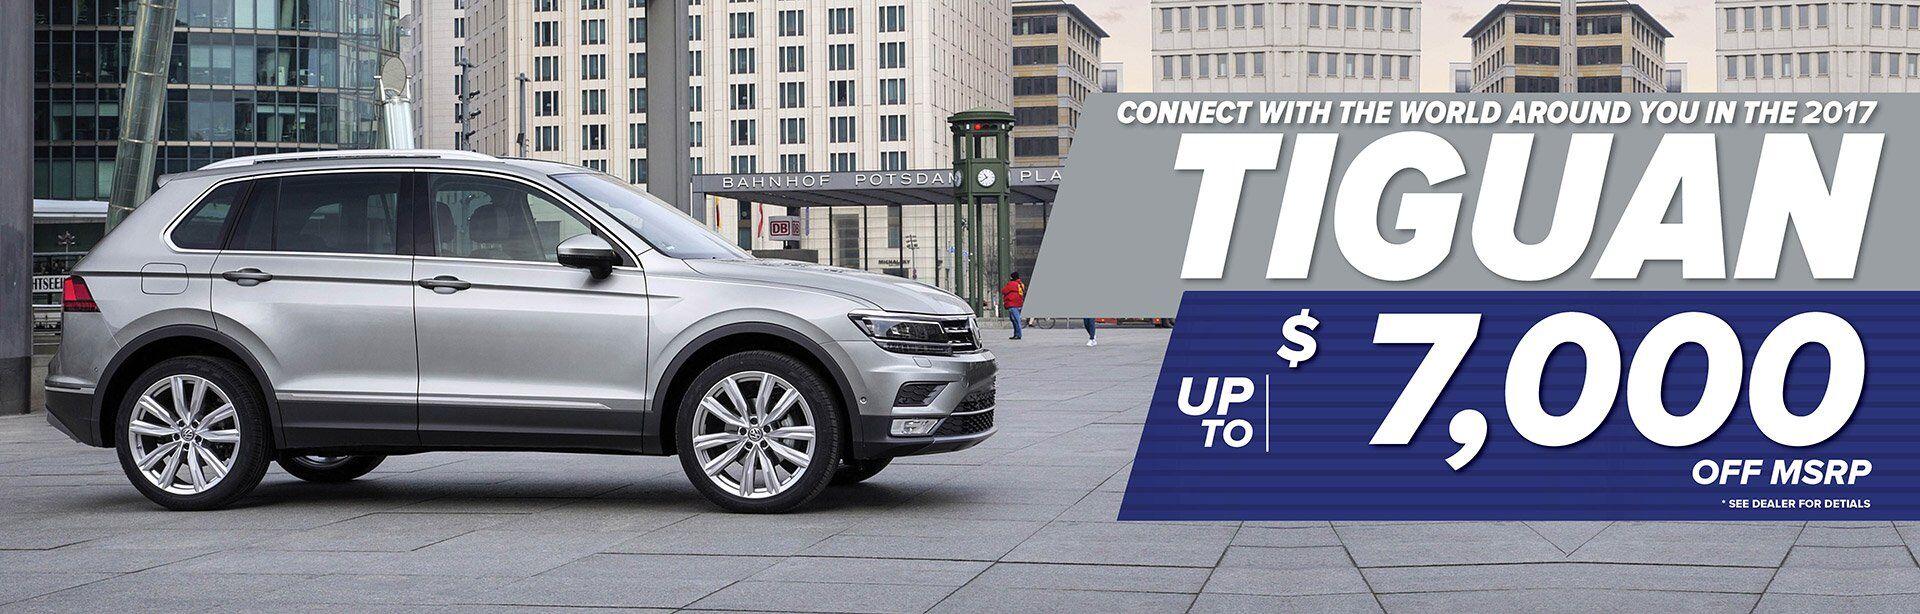 Volkswagen Mitsubishi Dealership Mission TX Used Cars